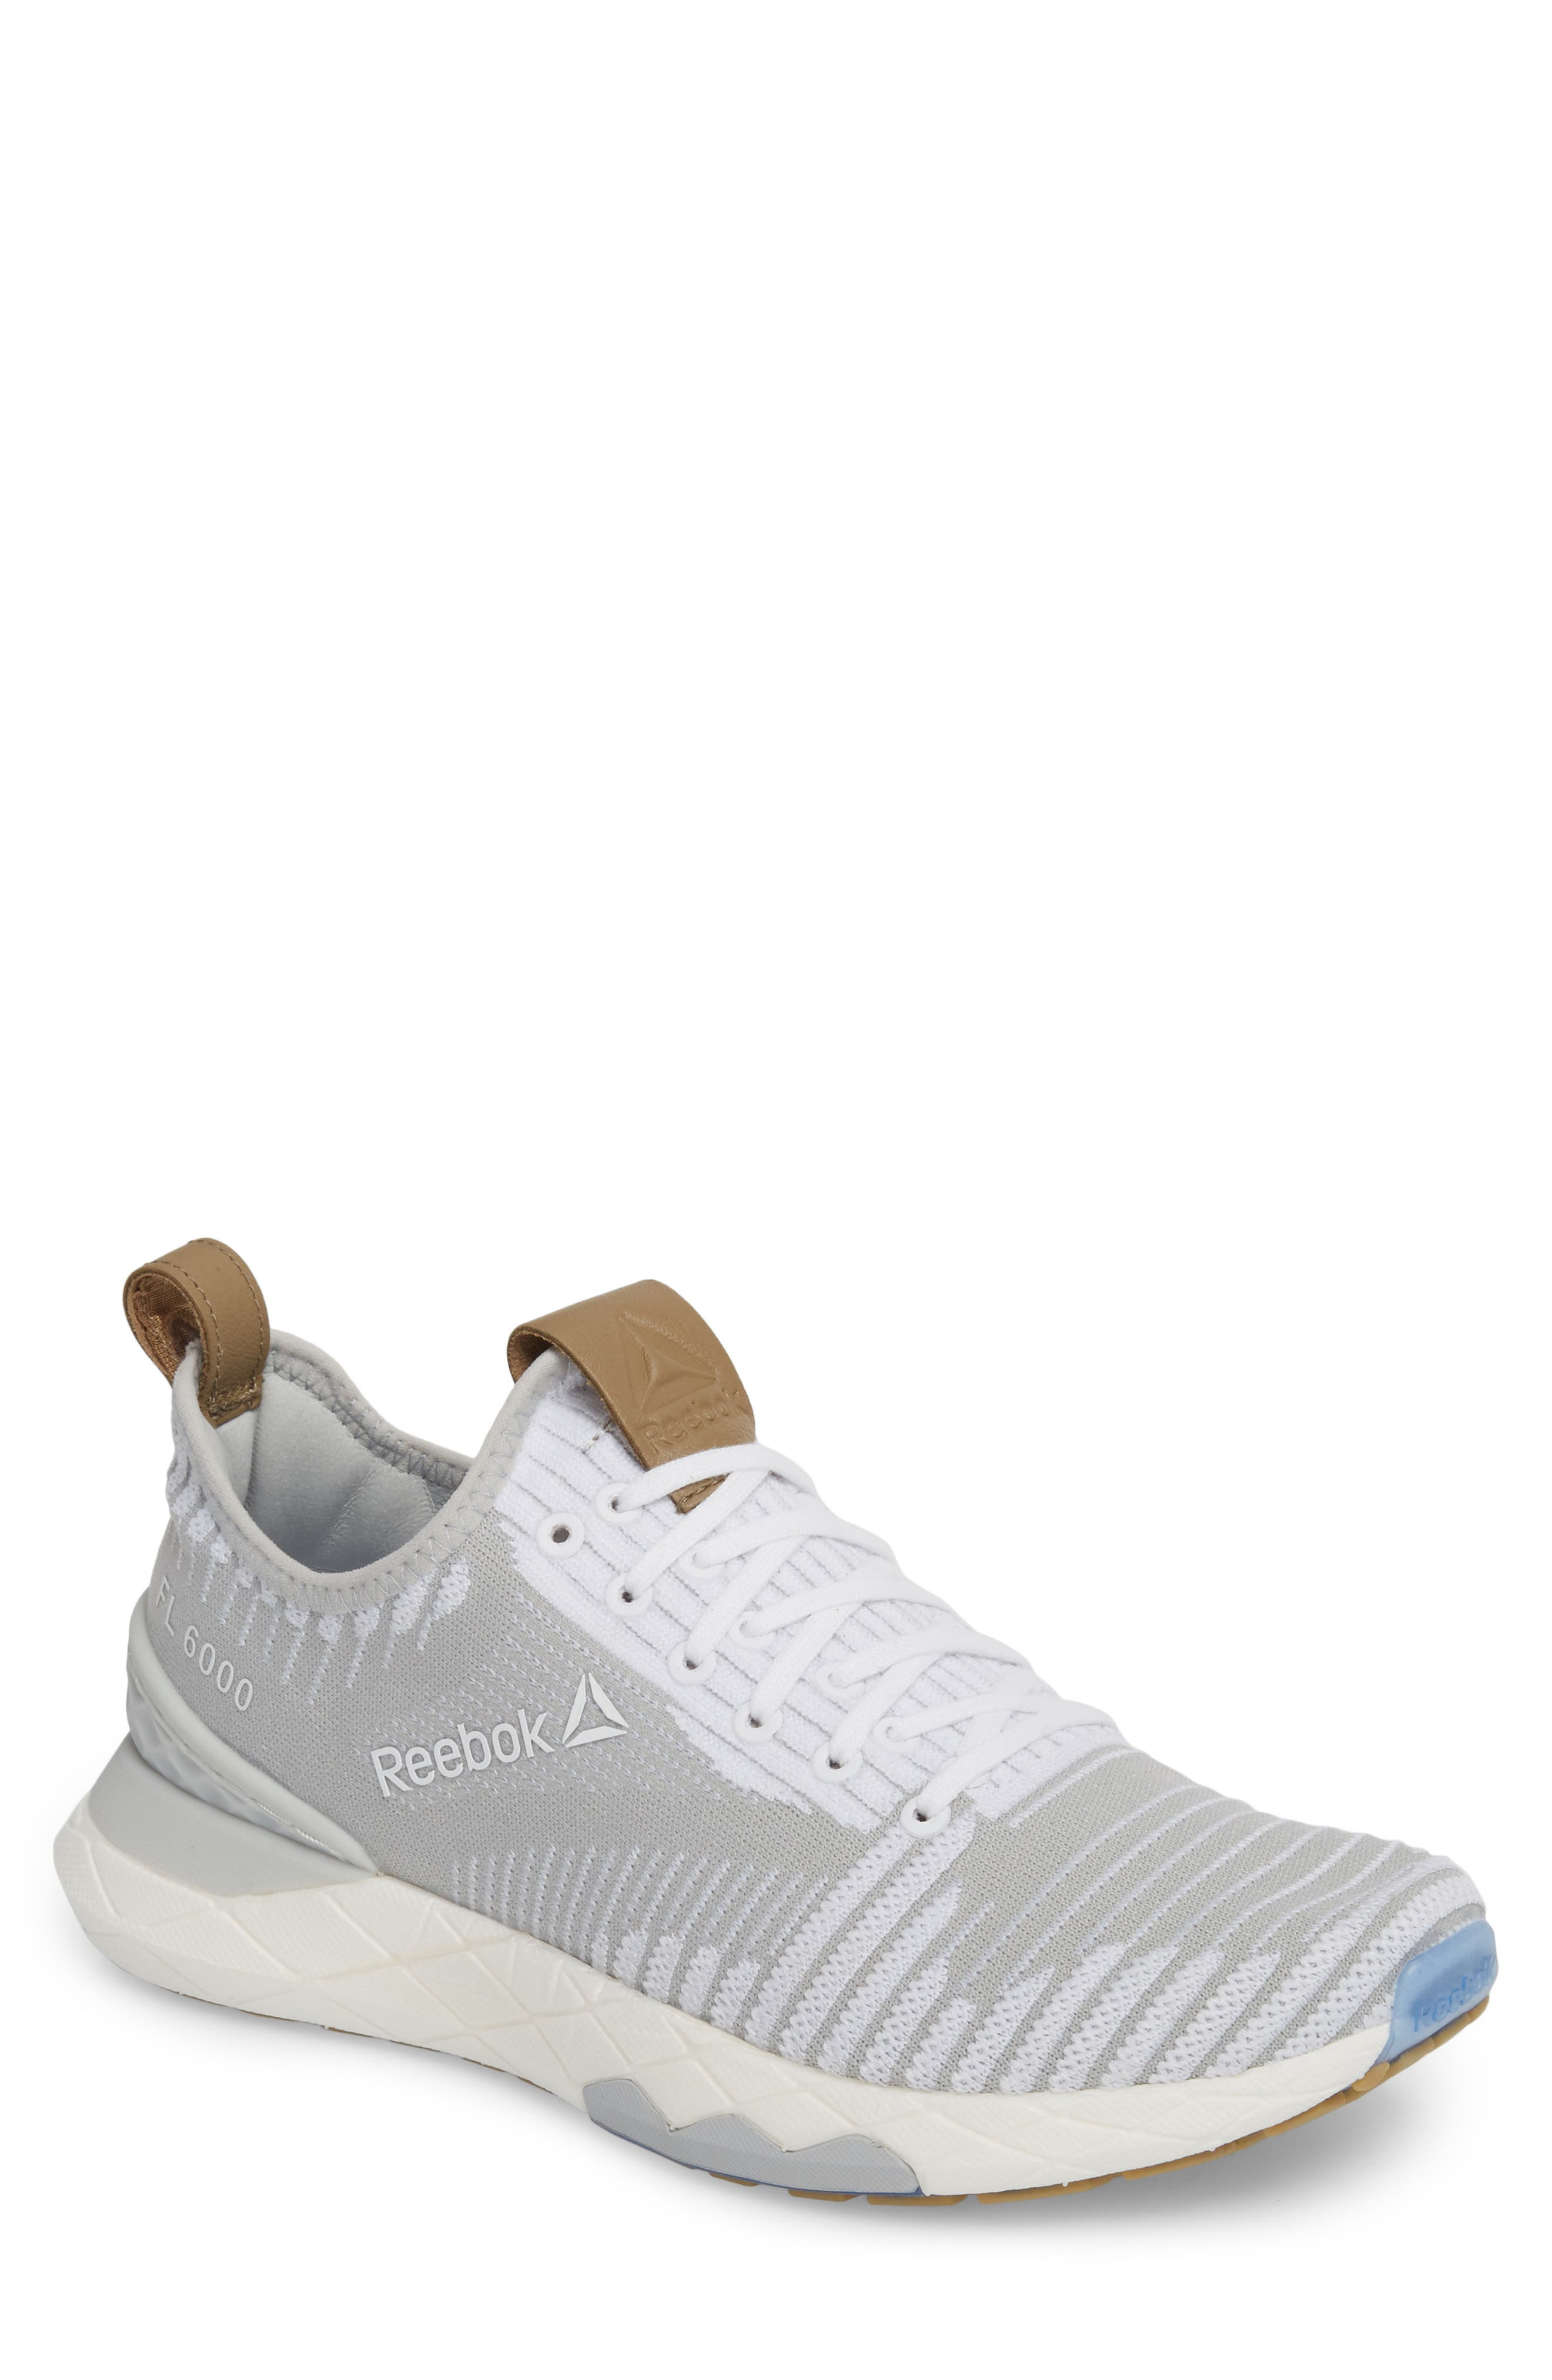 Shop Reebok Floatride Run 6000 Running Shoe In White  Skull Grey 234b9cabe